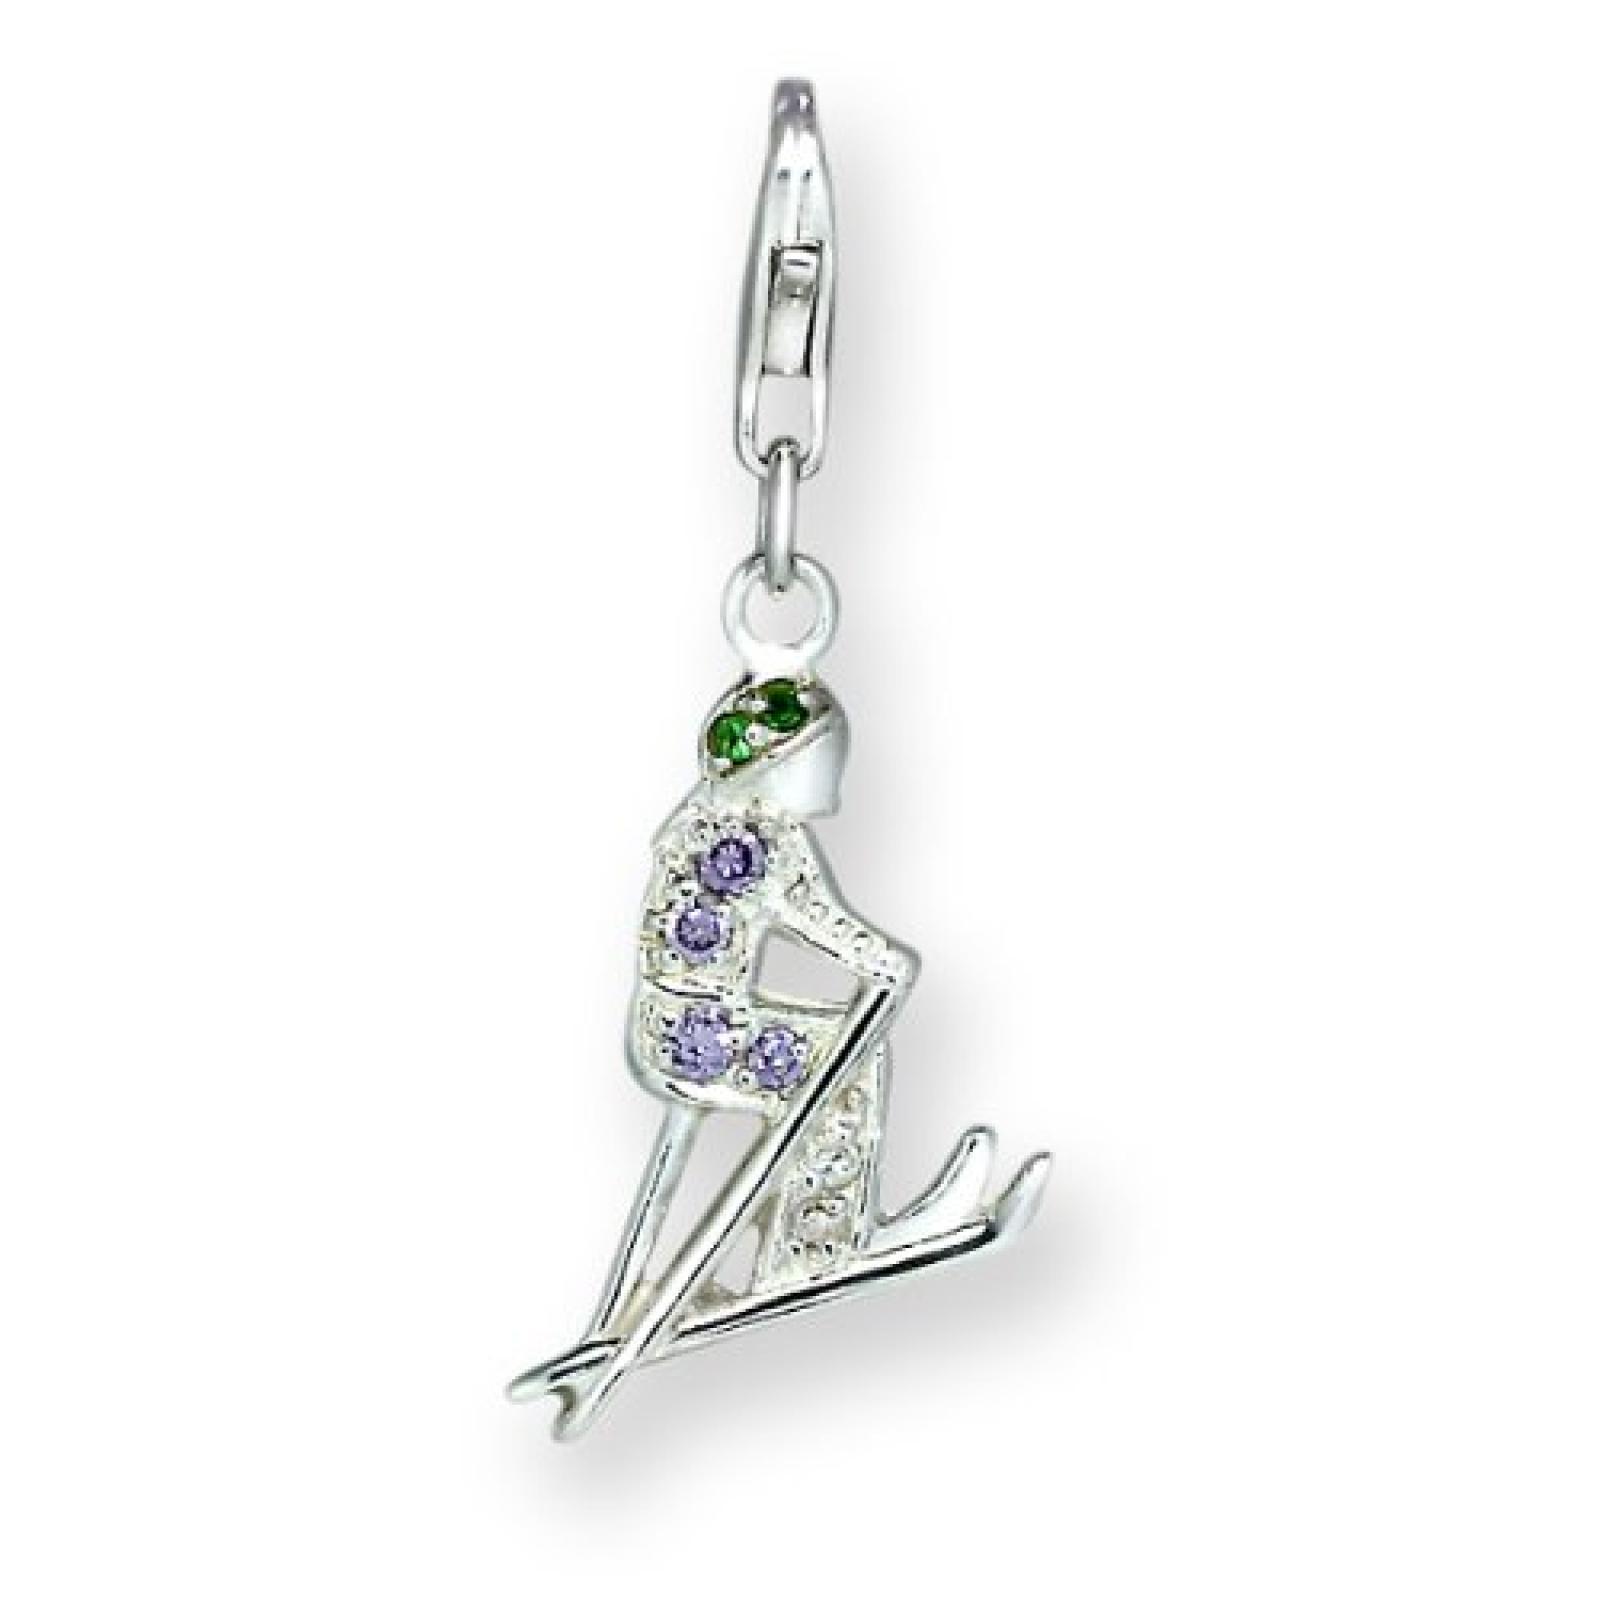 Rafaela Donata Charm Collection Damen-Charm Ski 925 Sterling Silber Zirkonia lila / grün  60600104